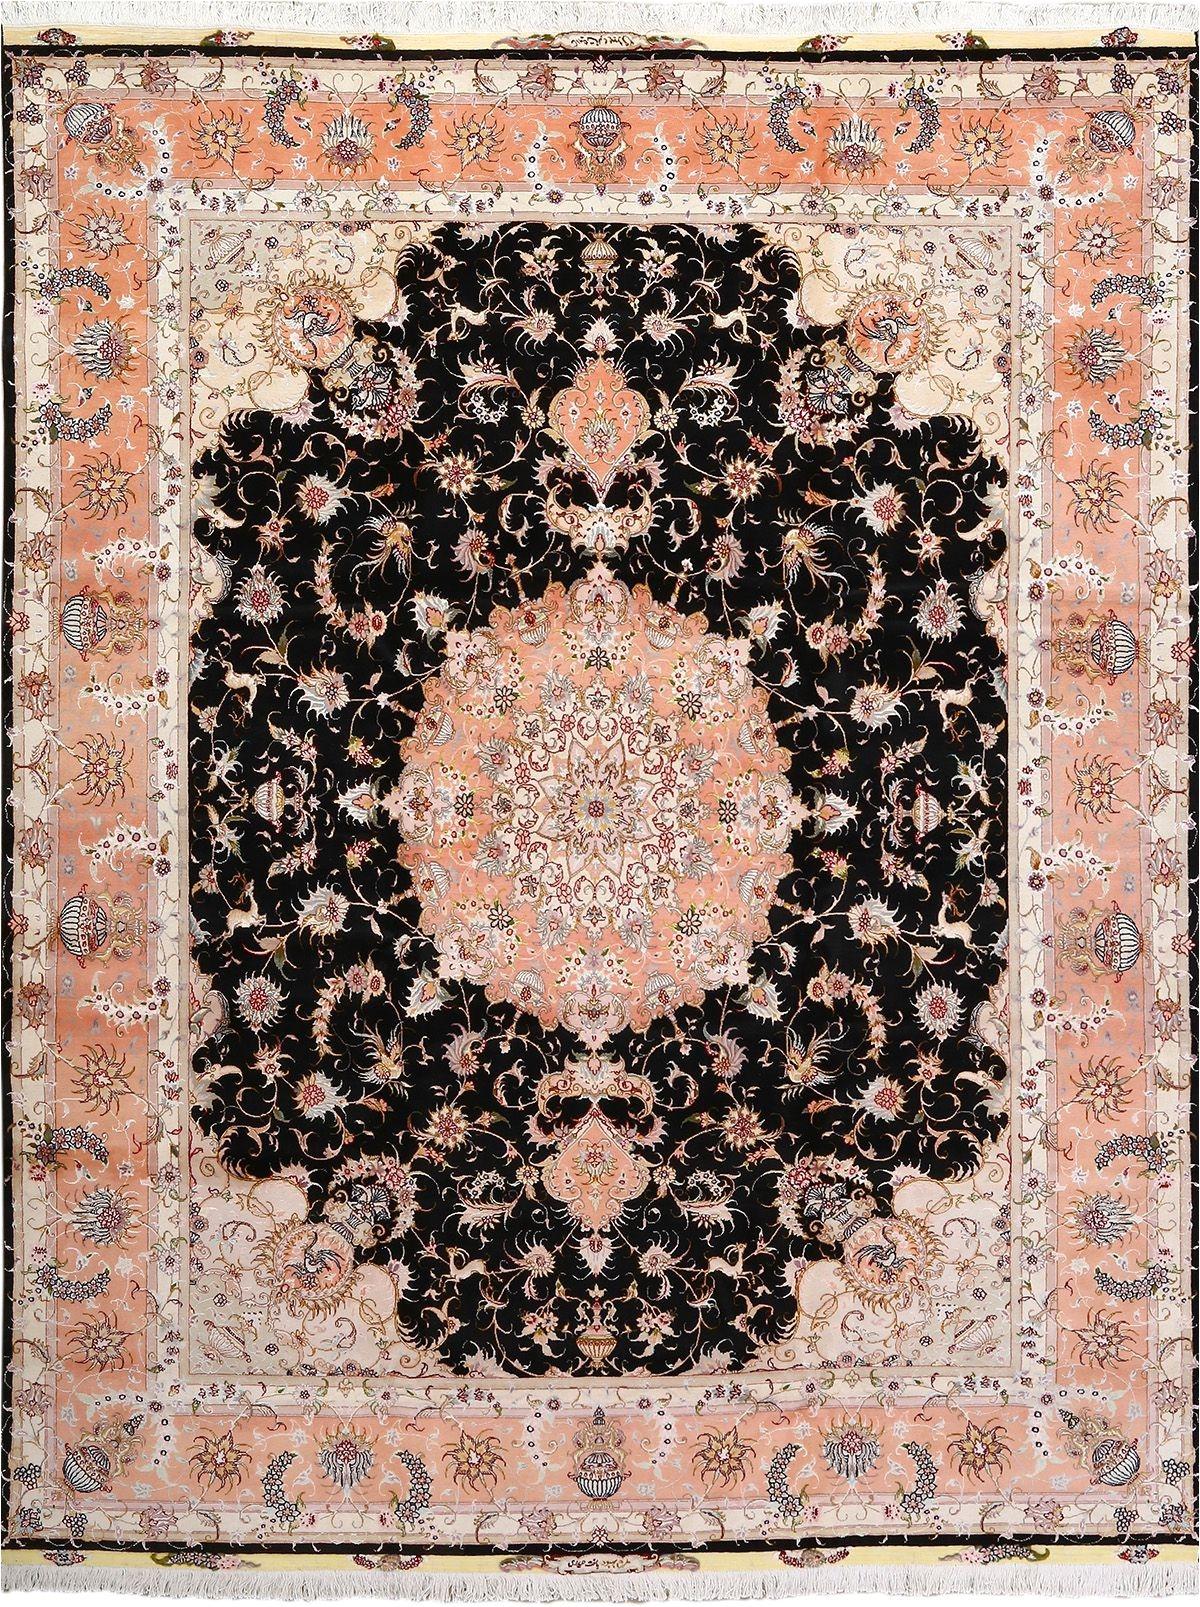 intricate animal motif vintage tabriz persian rug 51102 by nazmiyal pinterest persian vintage modern and vintage